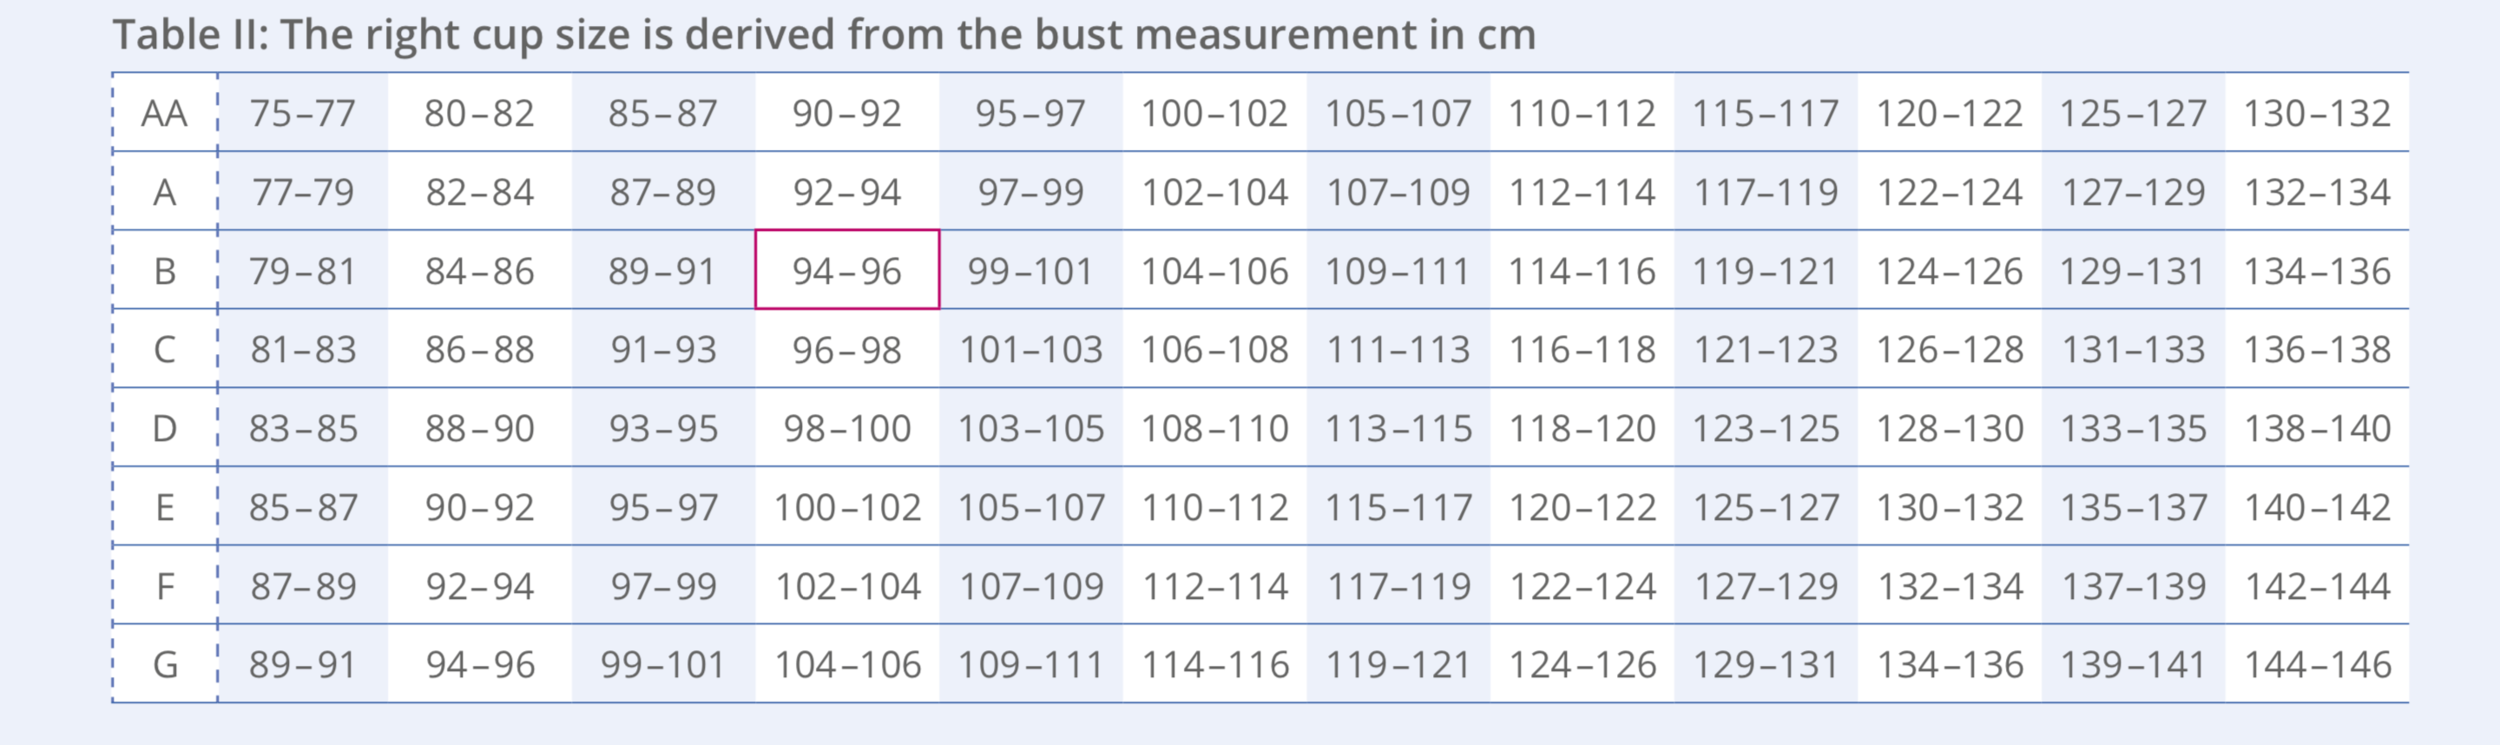 wirefree bra bust measurement